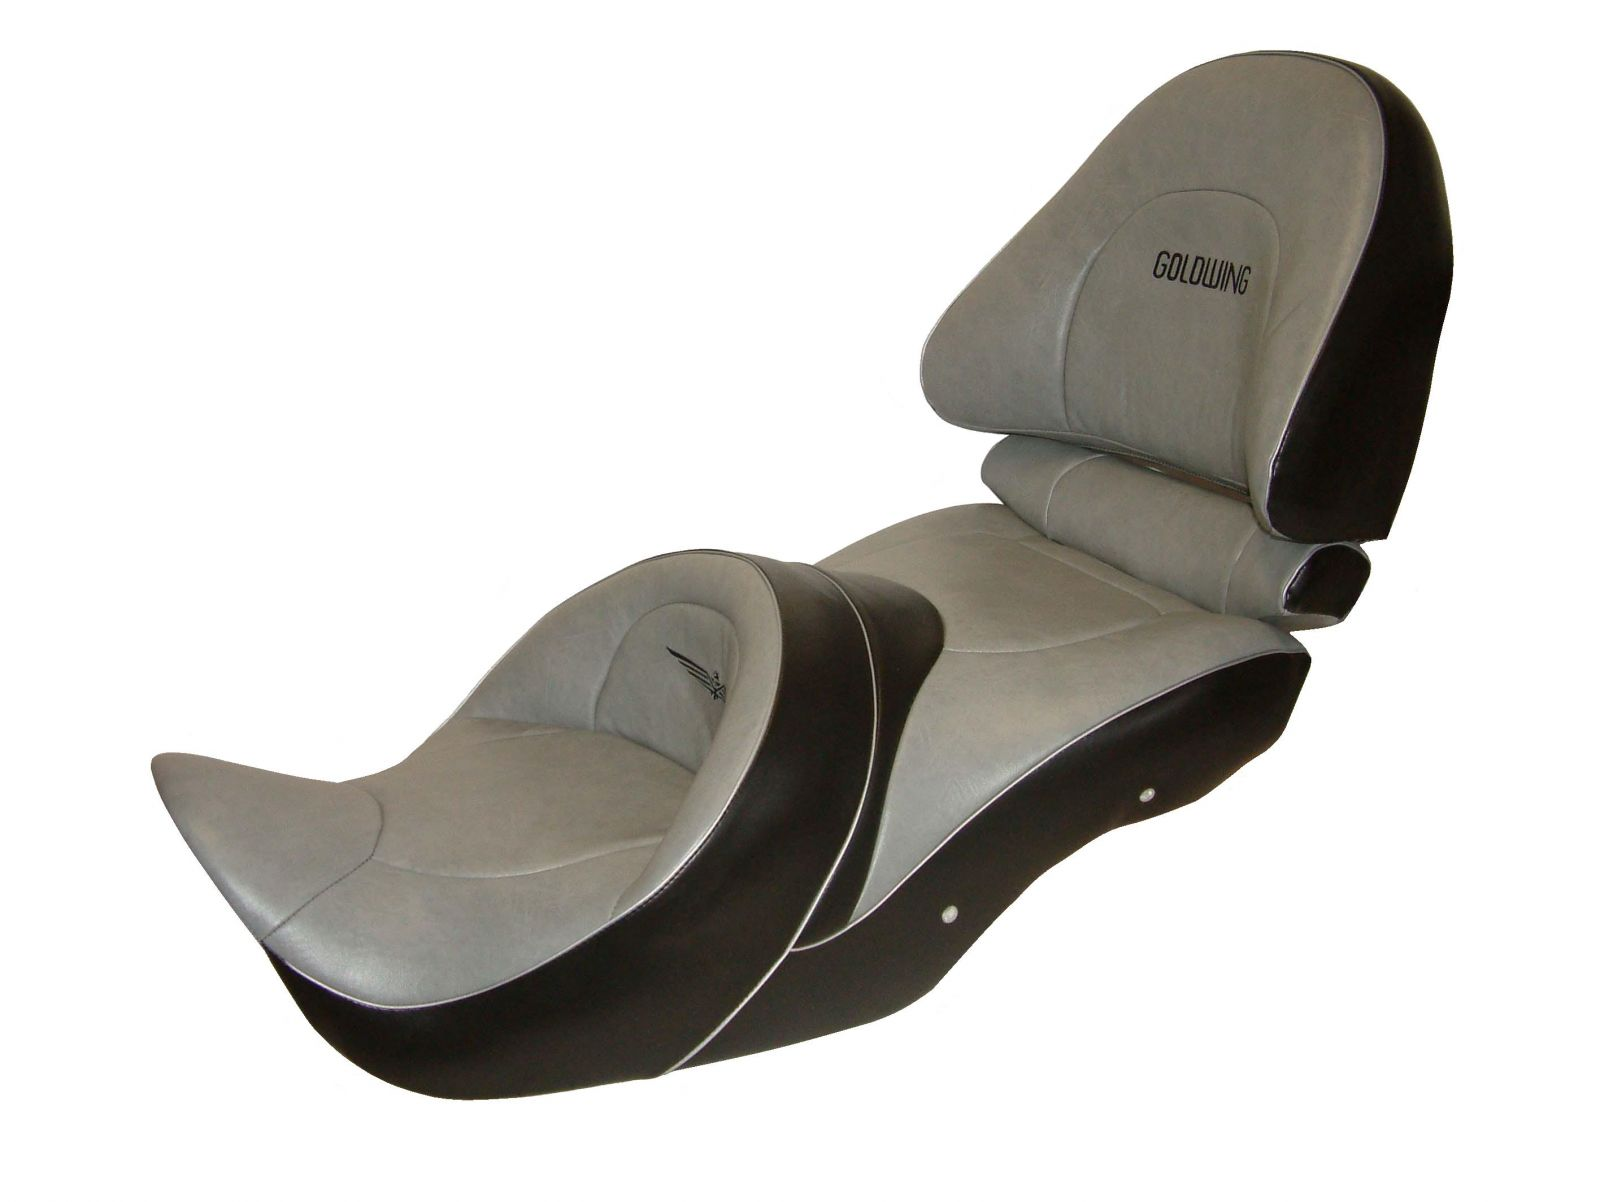 Deluxe seat SGC2682 - HONDA GL 1800 GOLDWING [2001-2005]